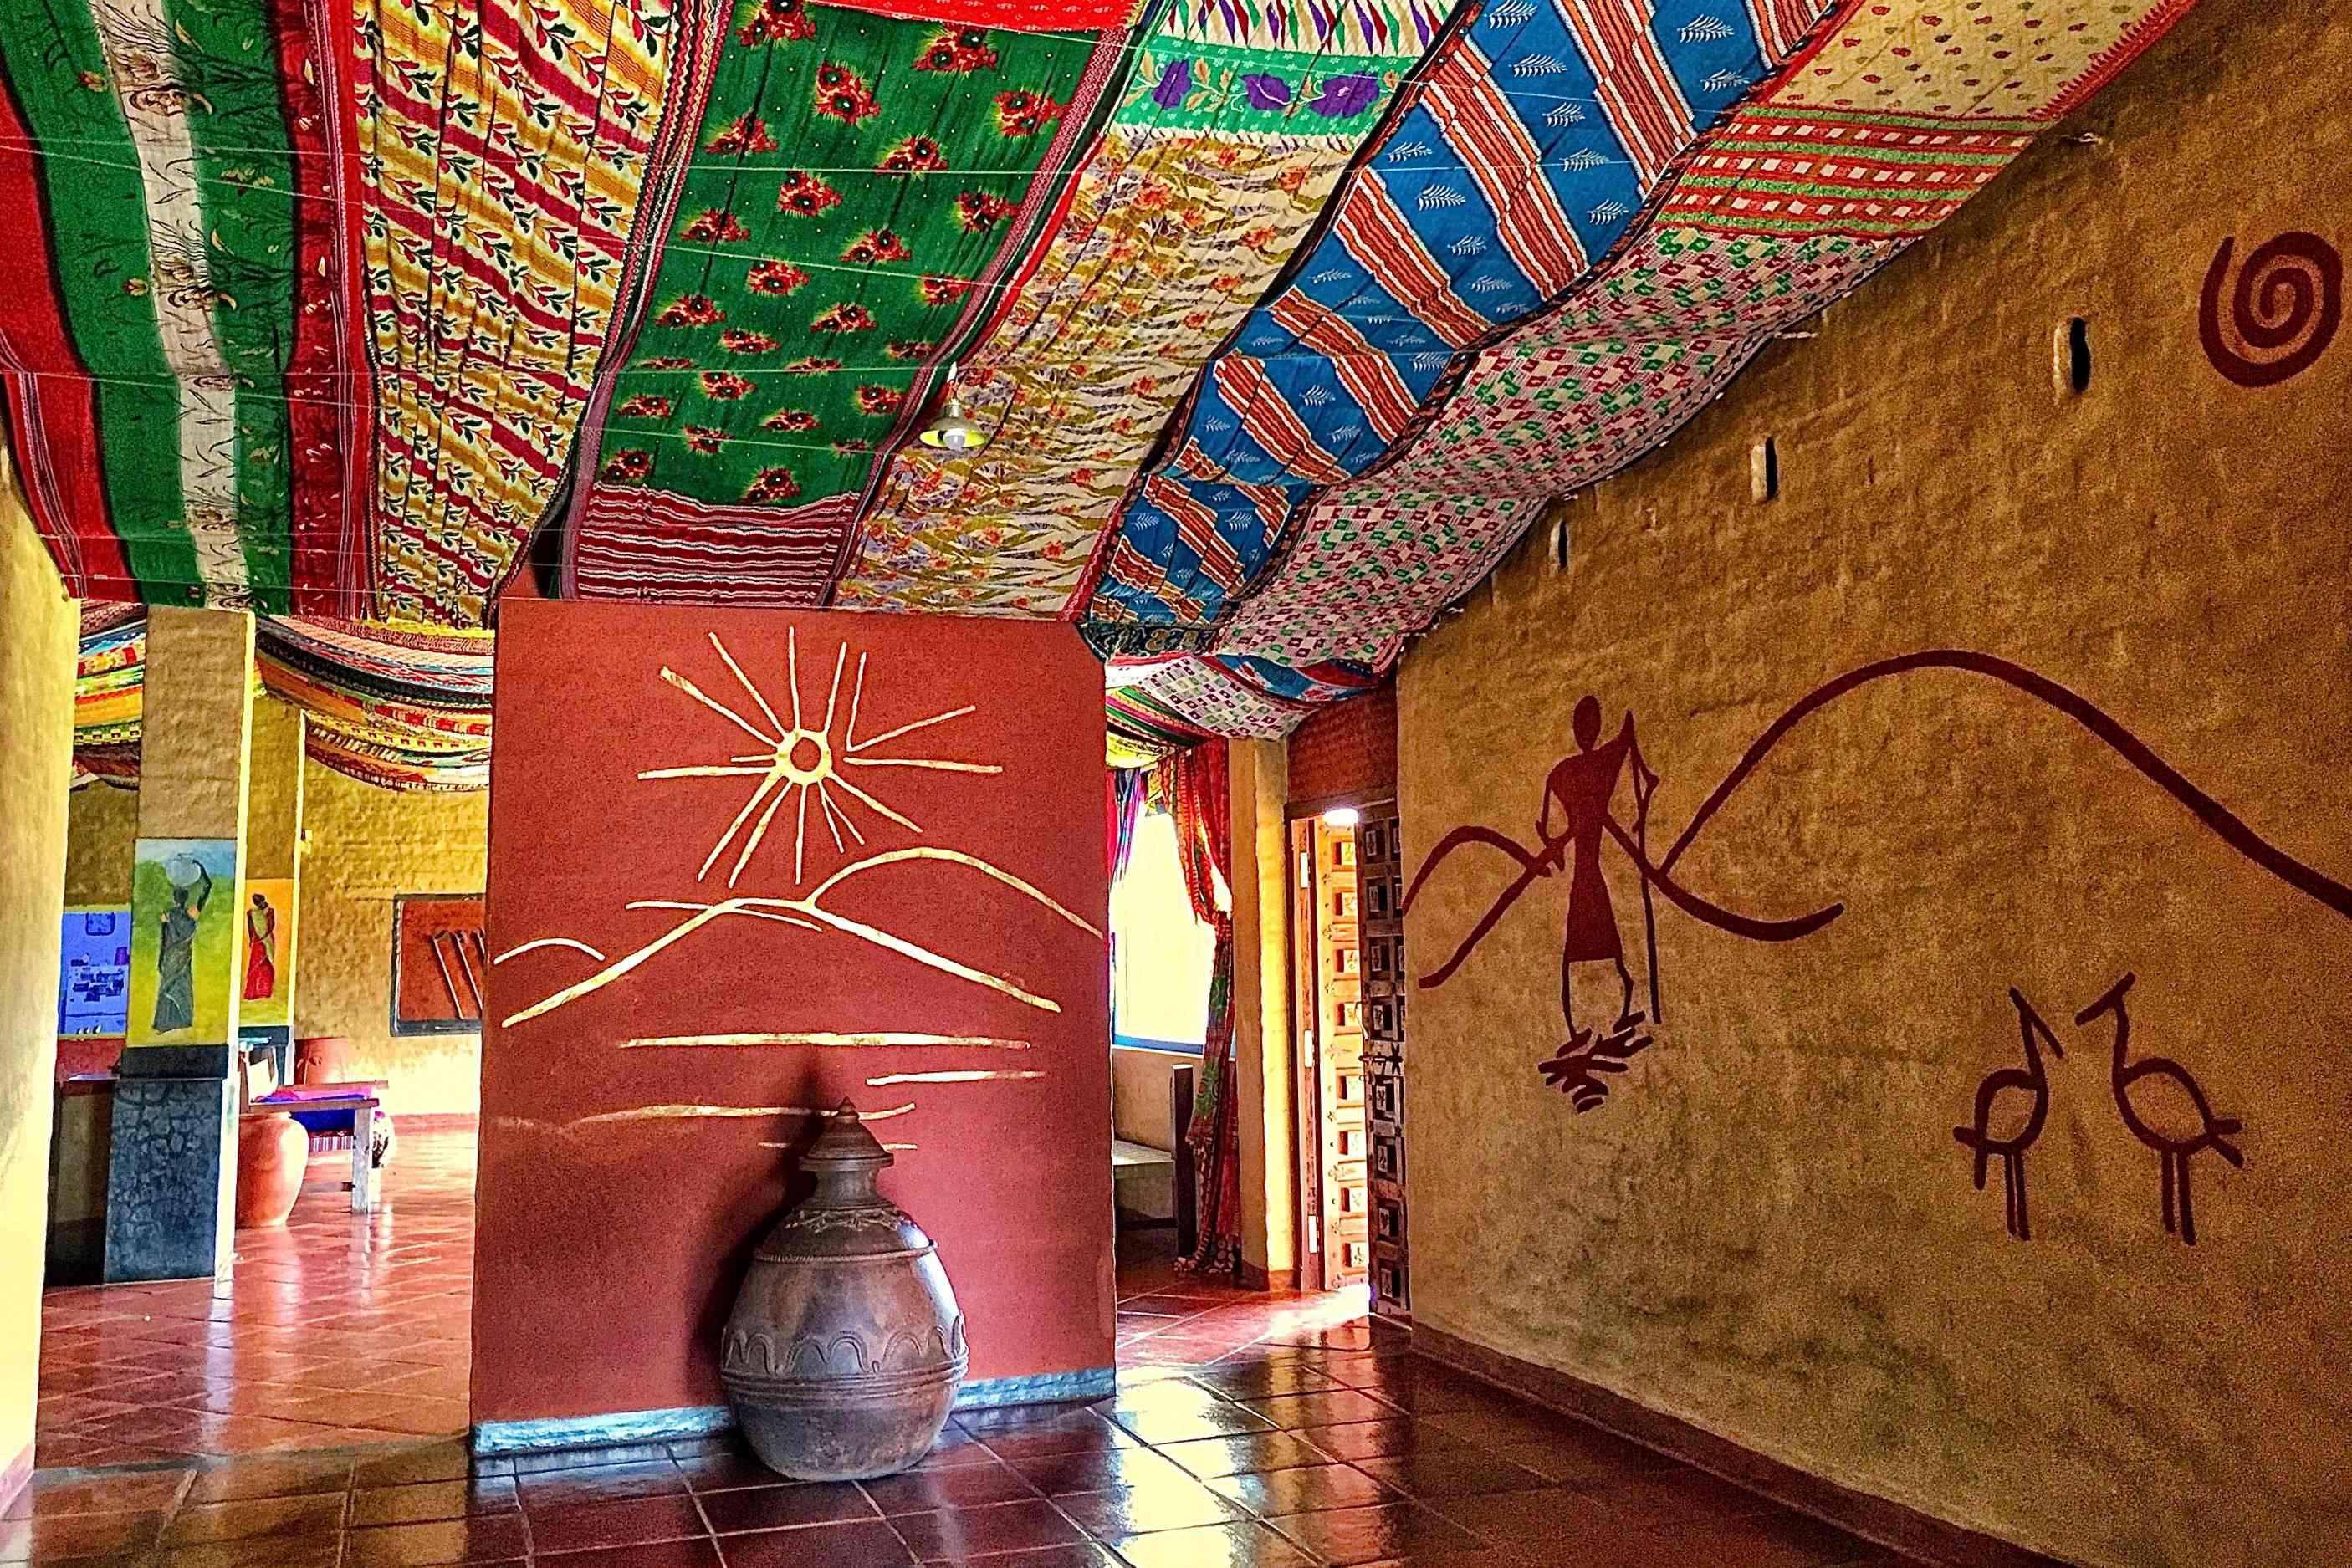 Chandoori Sai Guesthouse interior.